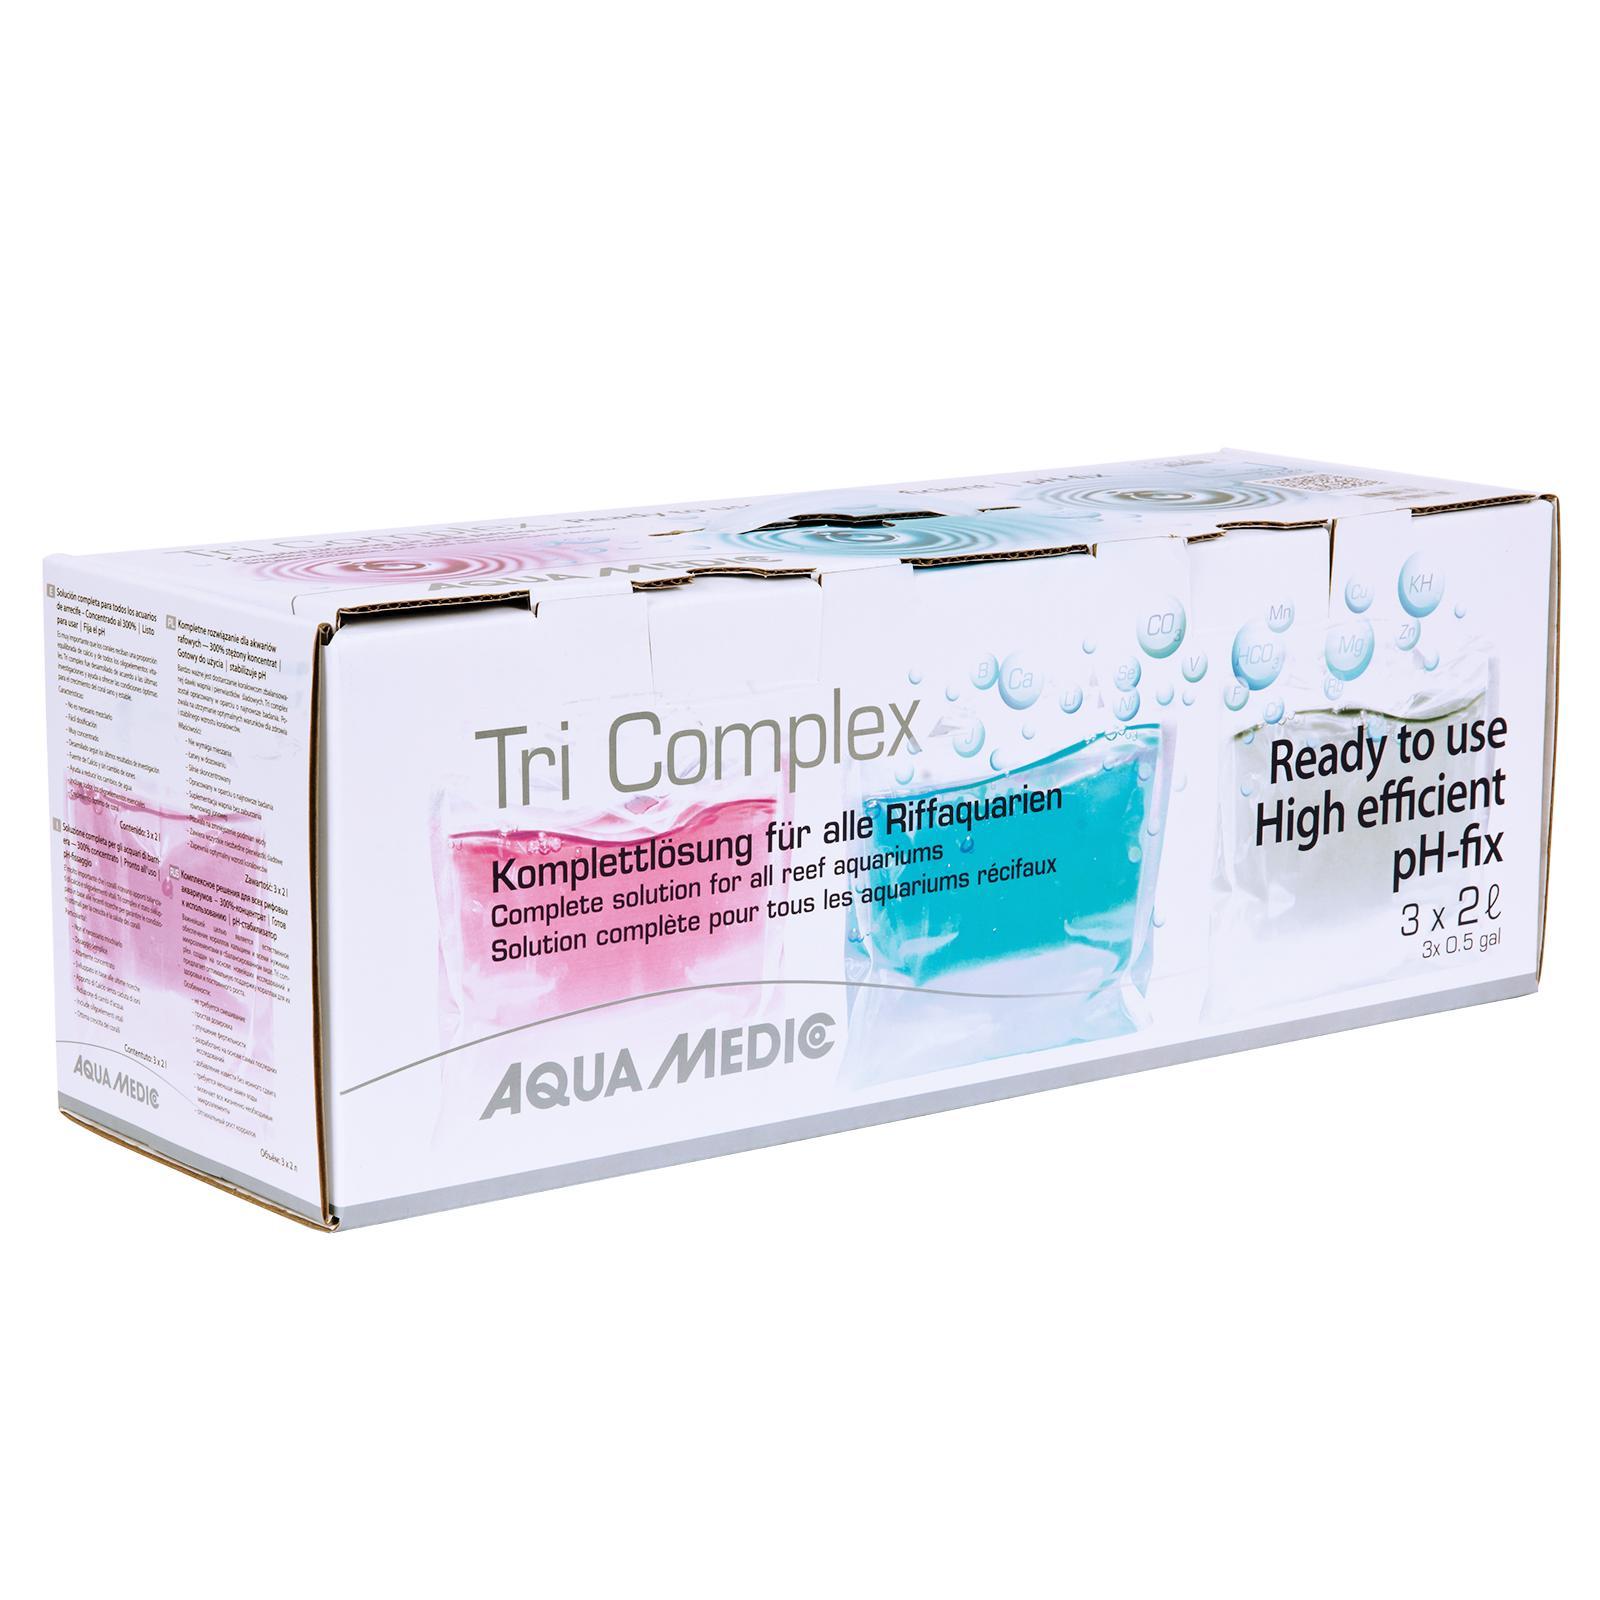 AQUA MEDIC Tri Complex 3 x 2L solution complète pour mode Balling en aquarium récifal